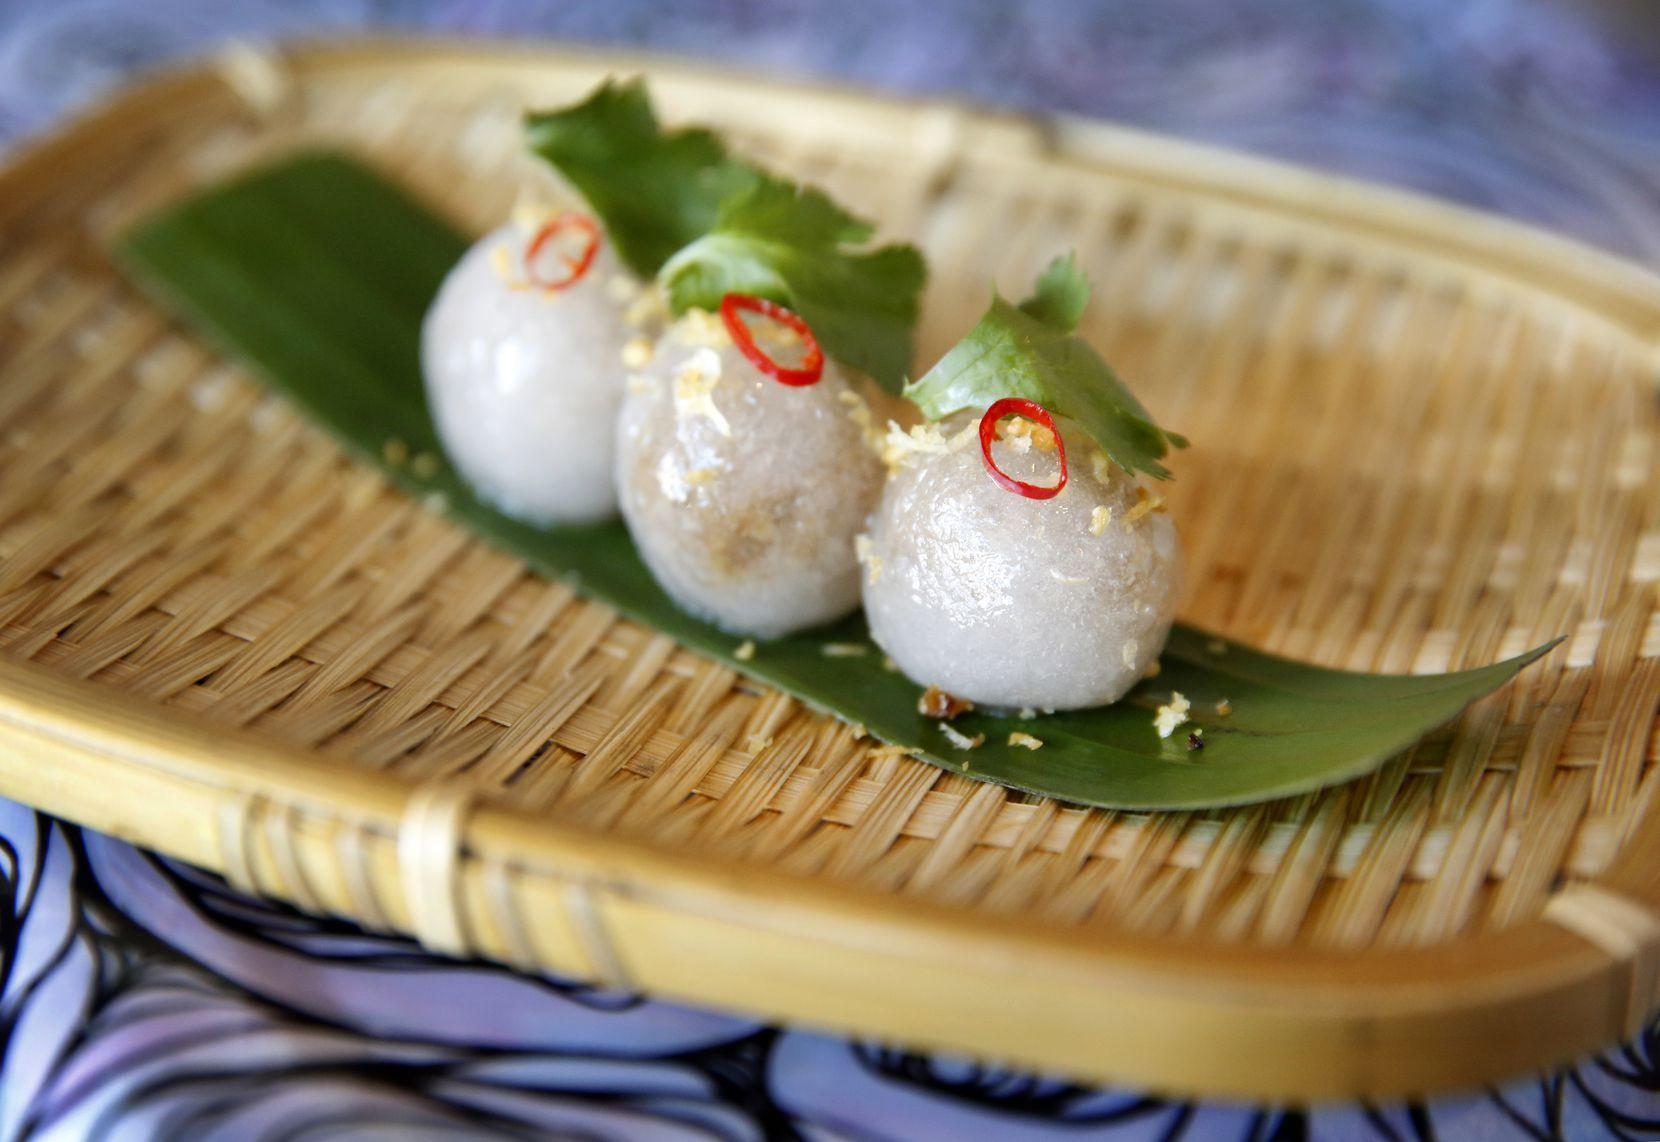 Sakoo are served at the Khao Noodle Shop